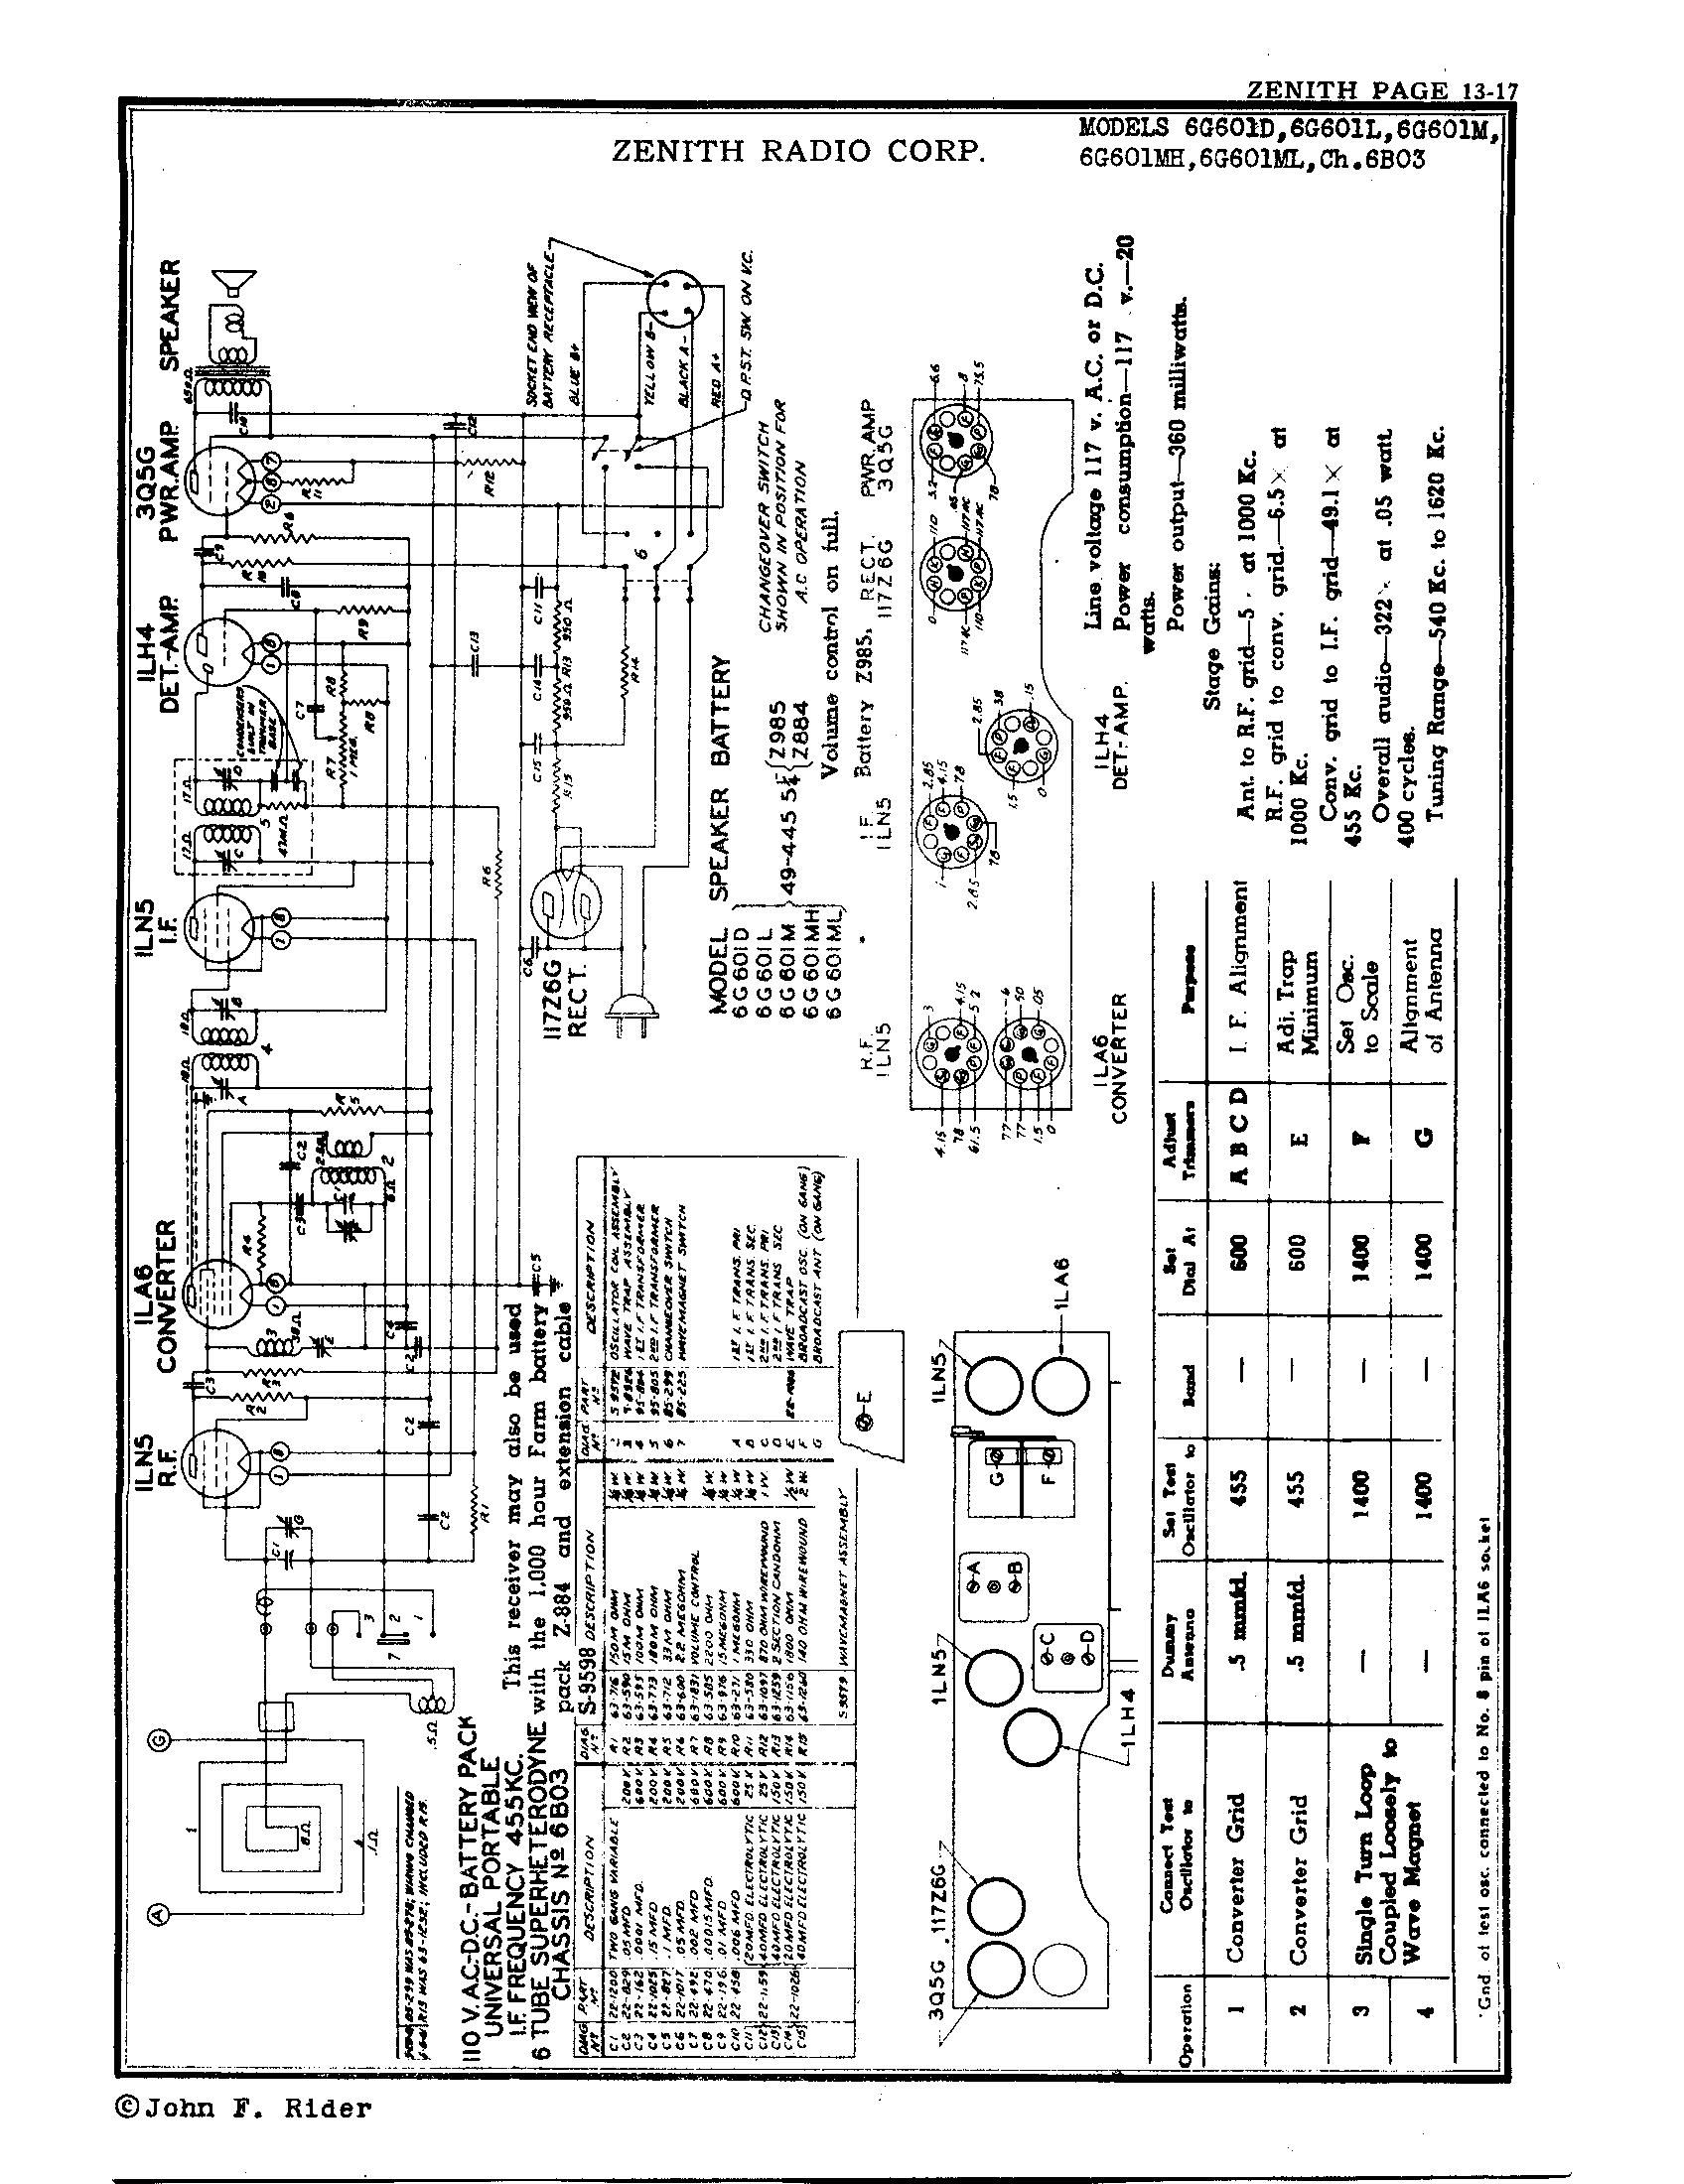 Zenith Radio Corp 6g601m